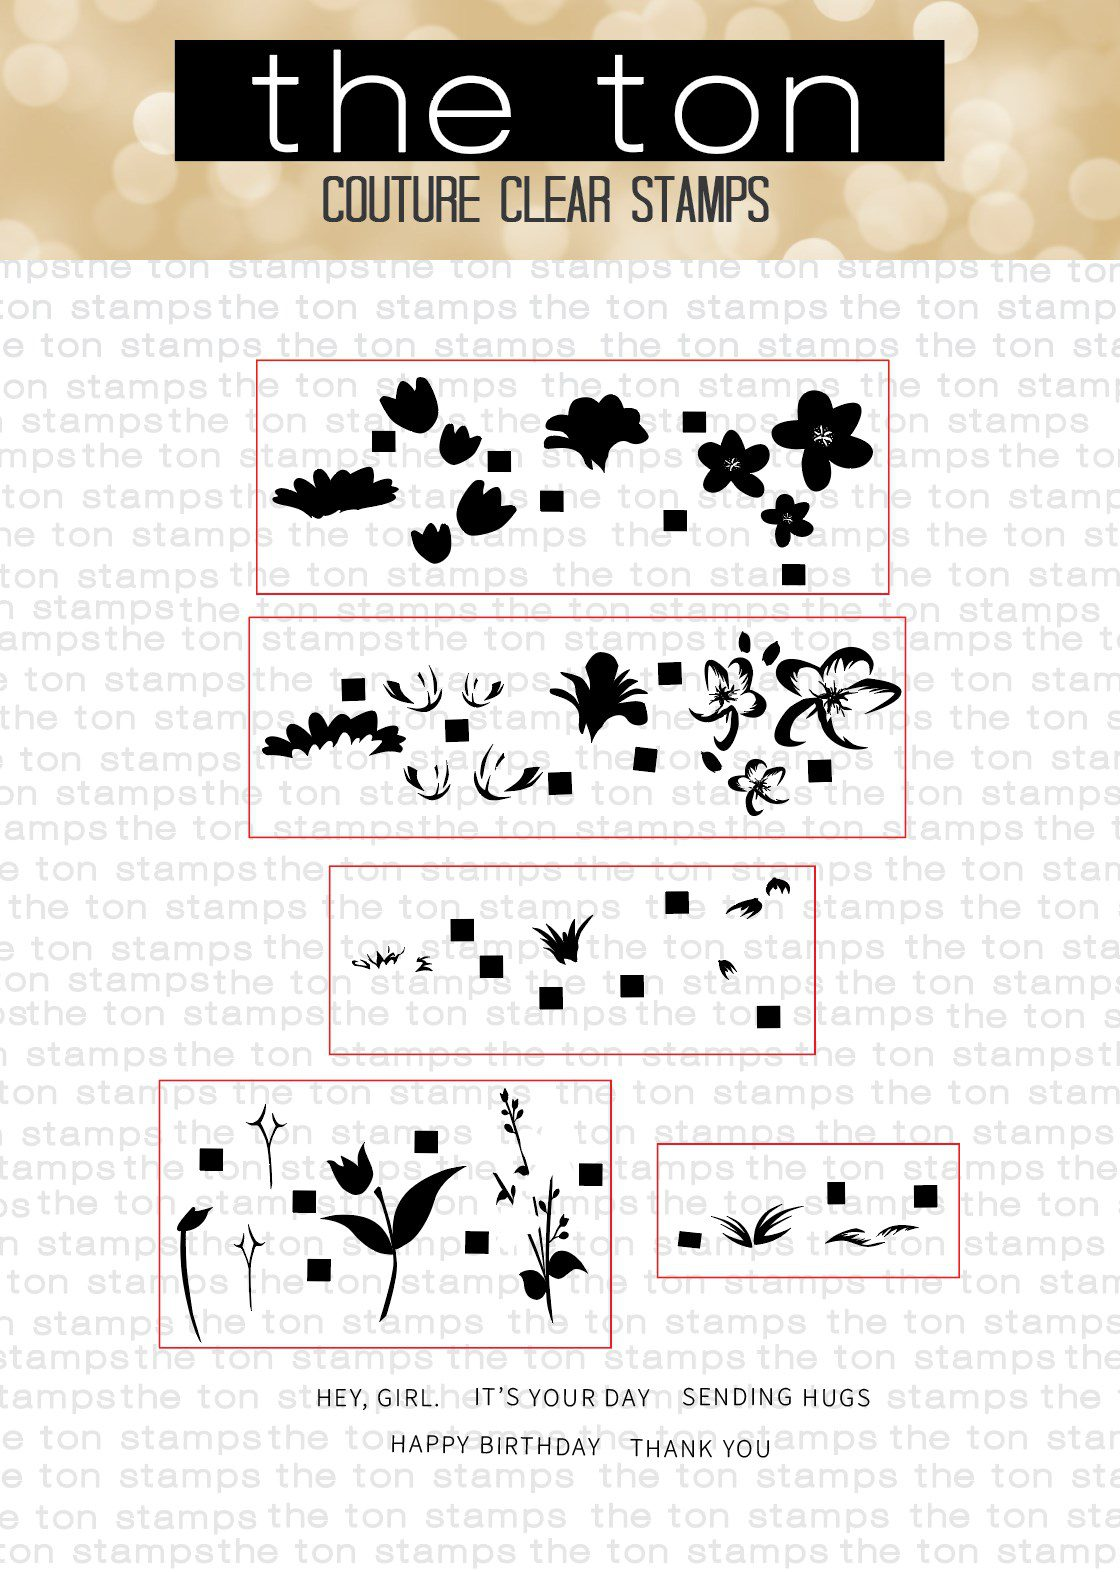 floral3ef674c9fd176649c89f9051e814eea51265cffdec397d743062752c782d724e2bbits-2157180